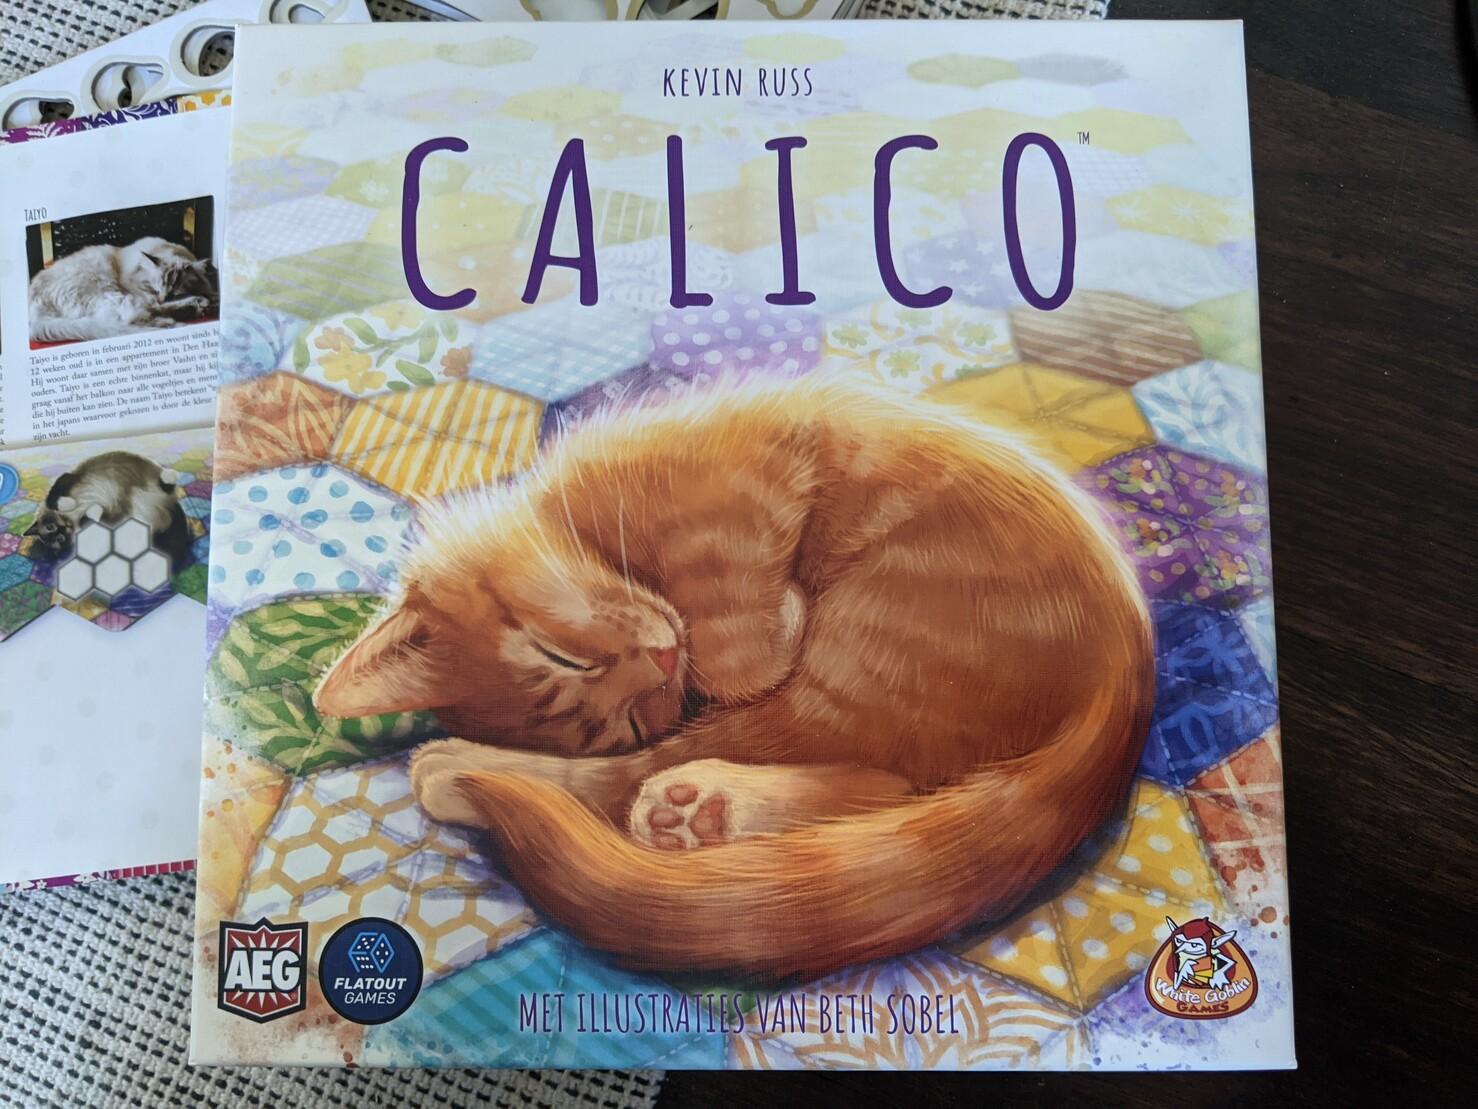 Box art of a sleeping cat